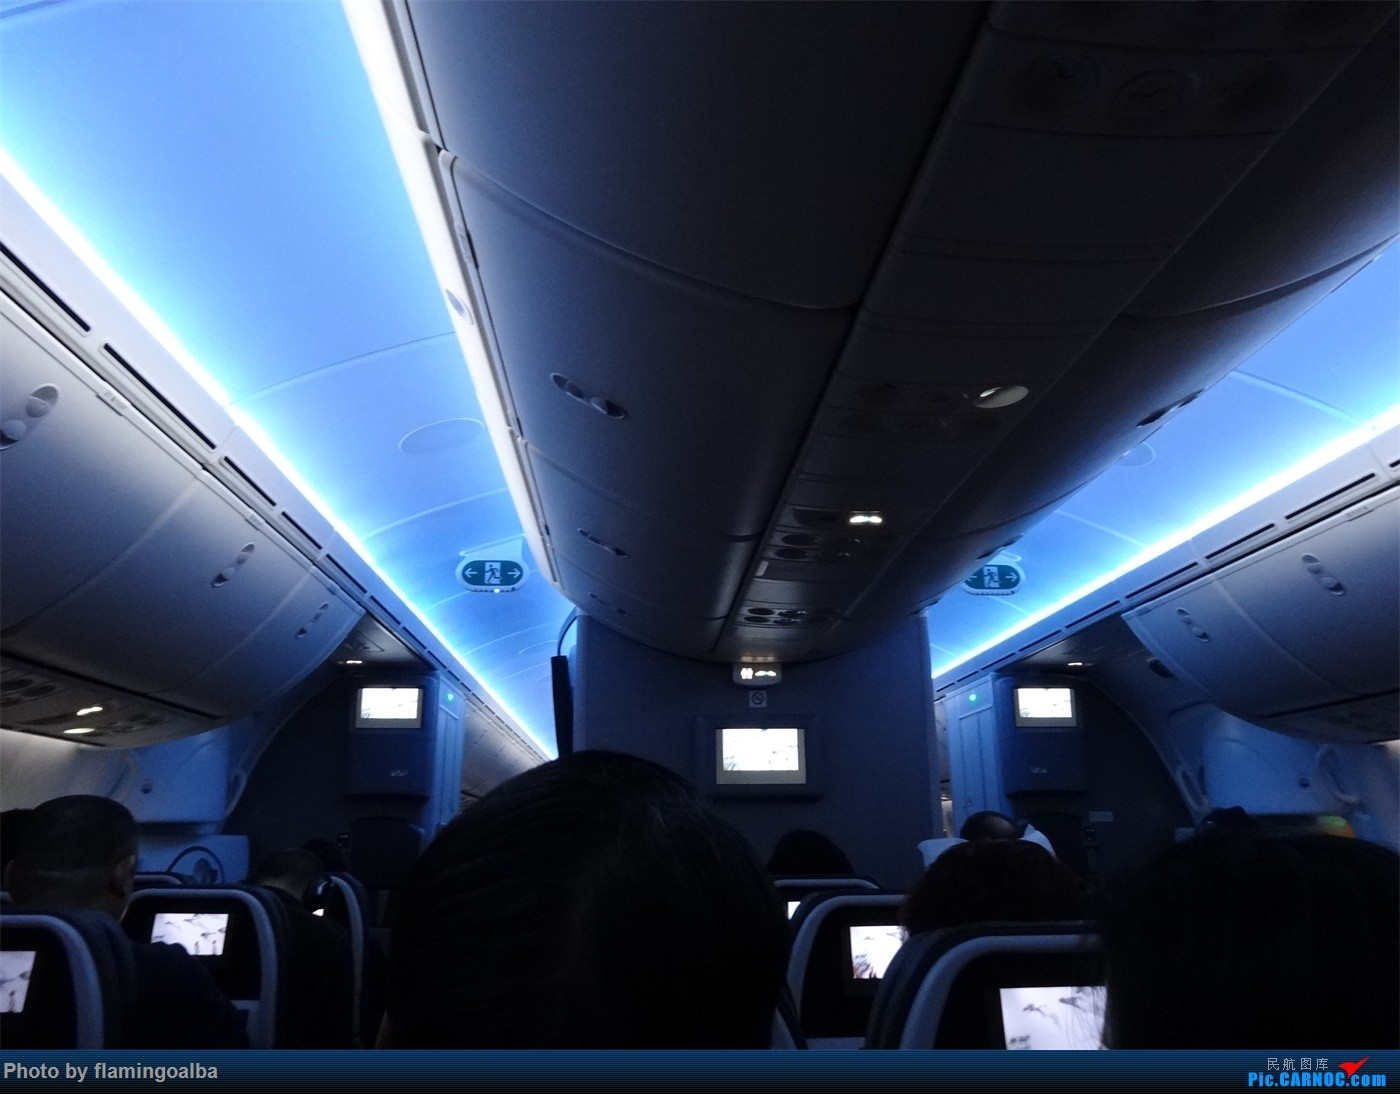 Re:[原创]浦东-达拉斯-纽瓦克-华盛顿里根-拉斯维加斯-洛杉矶-达拉斯-浦东 B787-8 N812AA 中国上海浦东国际机场